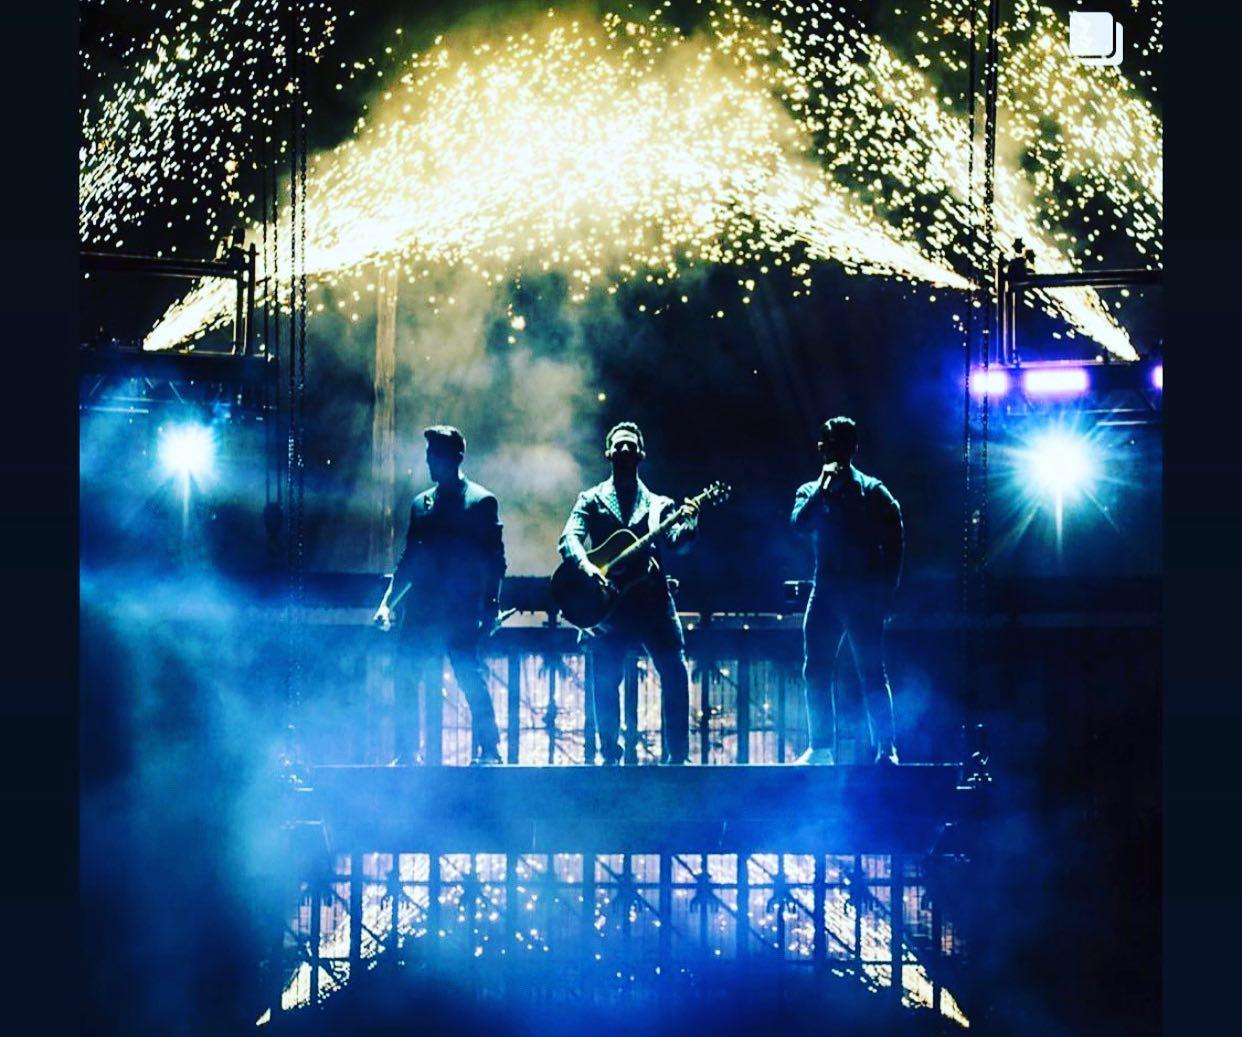 Concerti_jonas brothers_Milano_Febbraio 2020